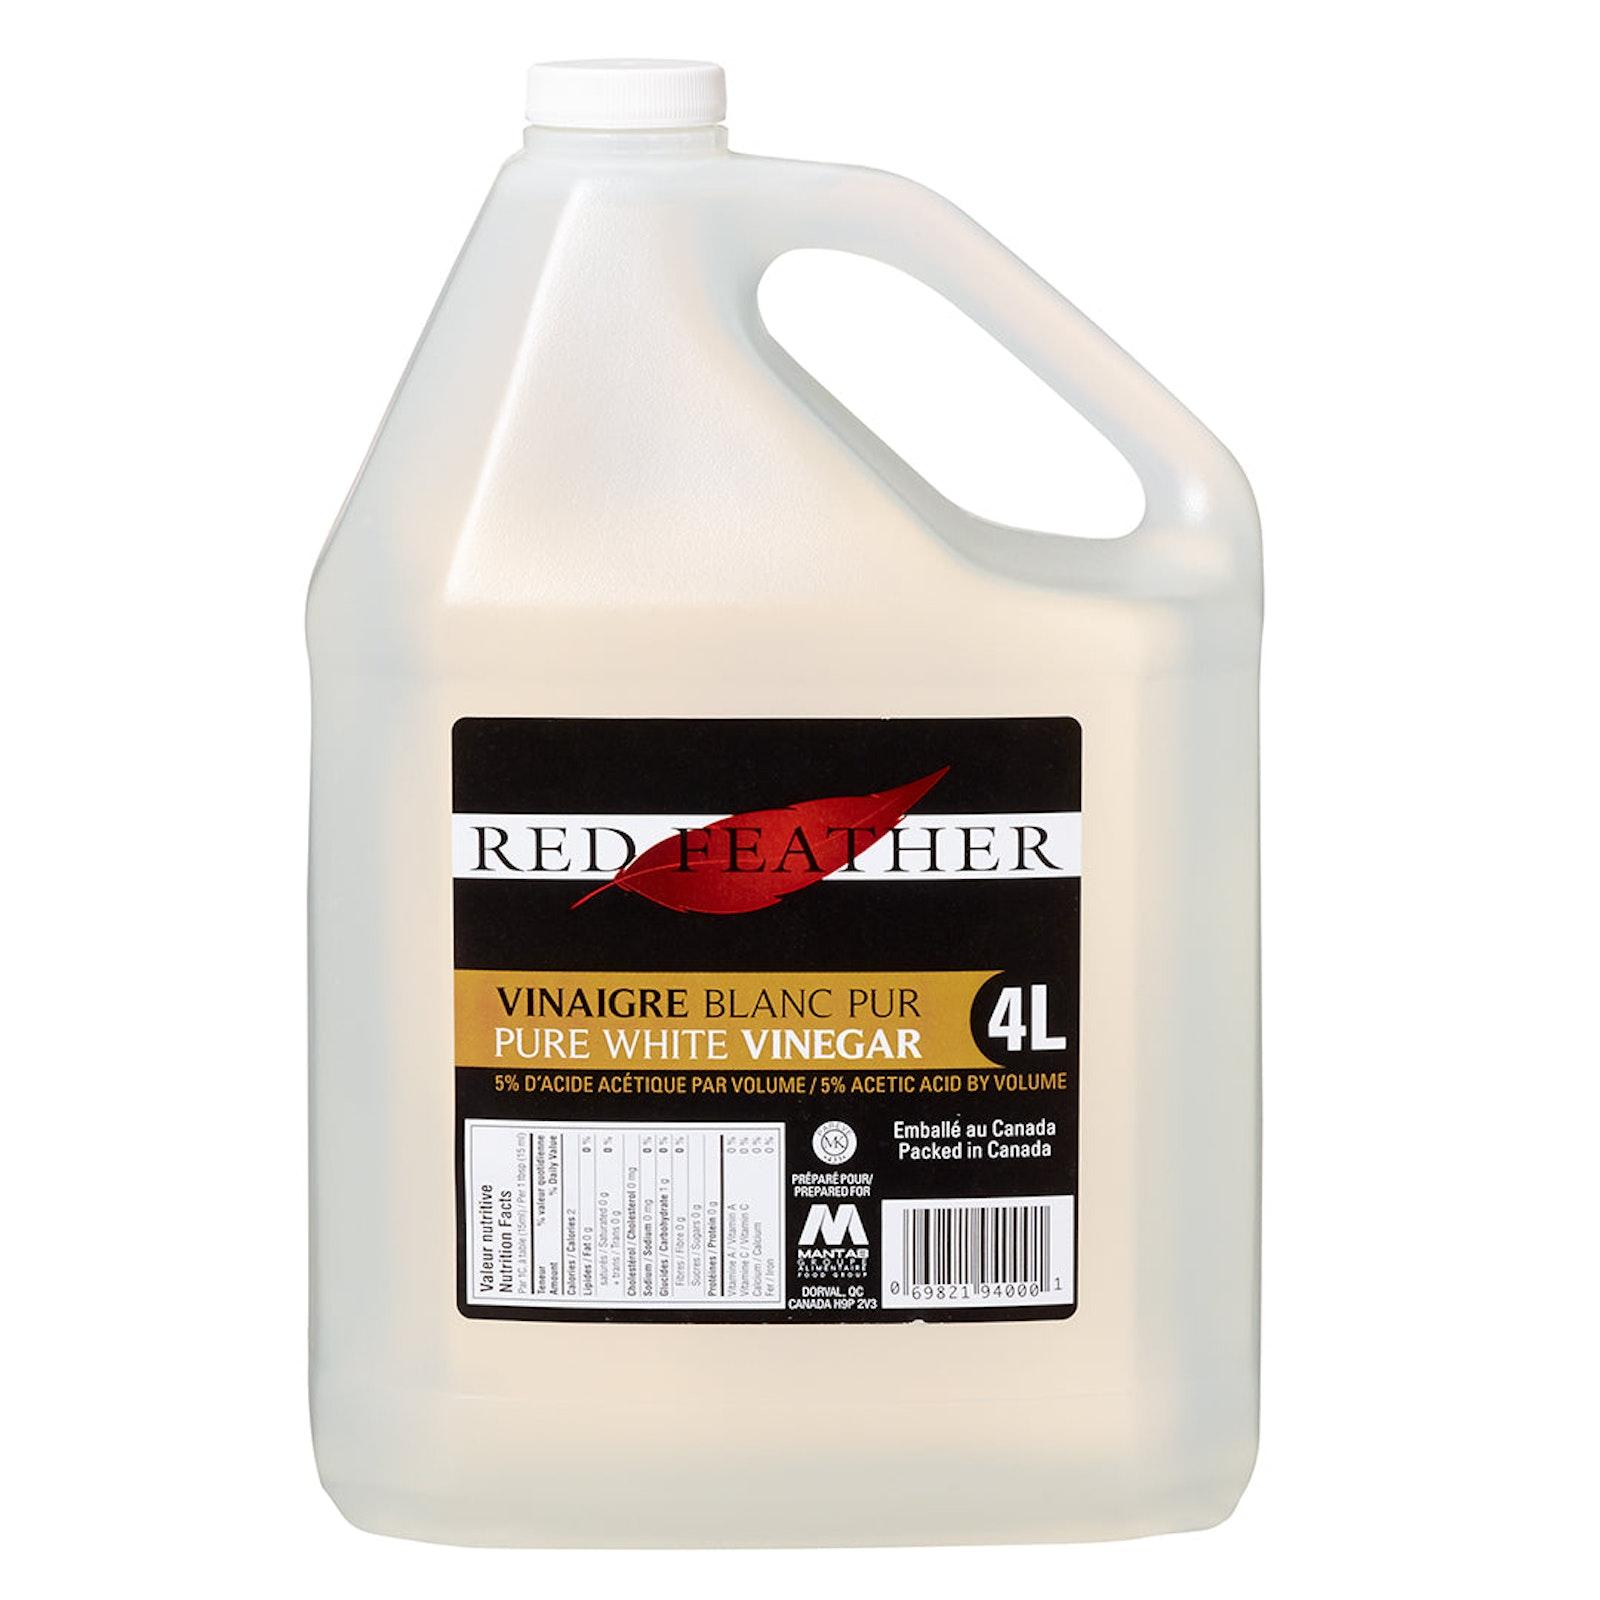 RED FEATHER White vinegar